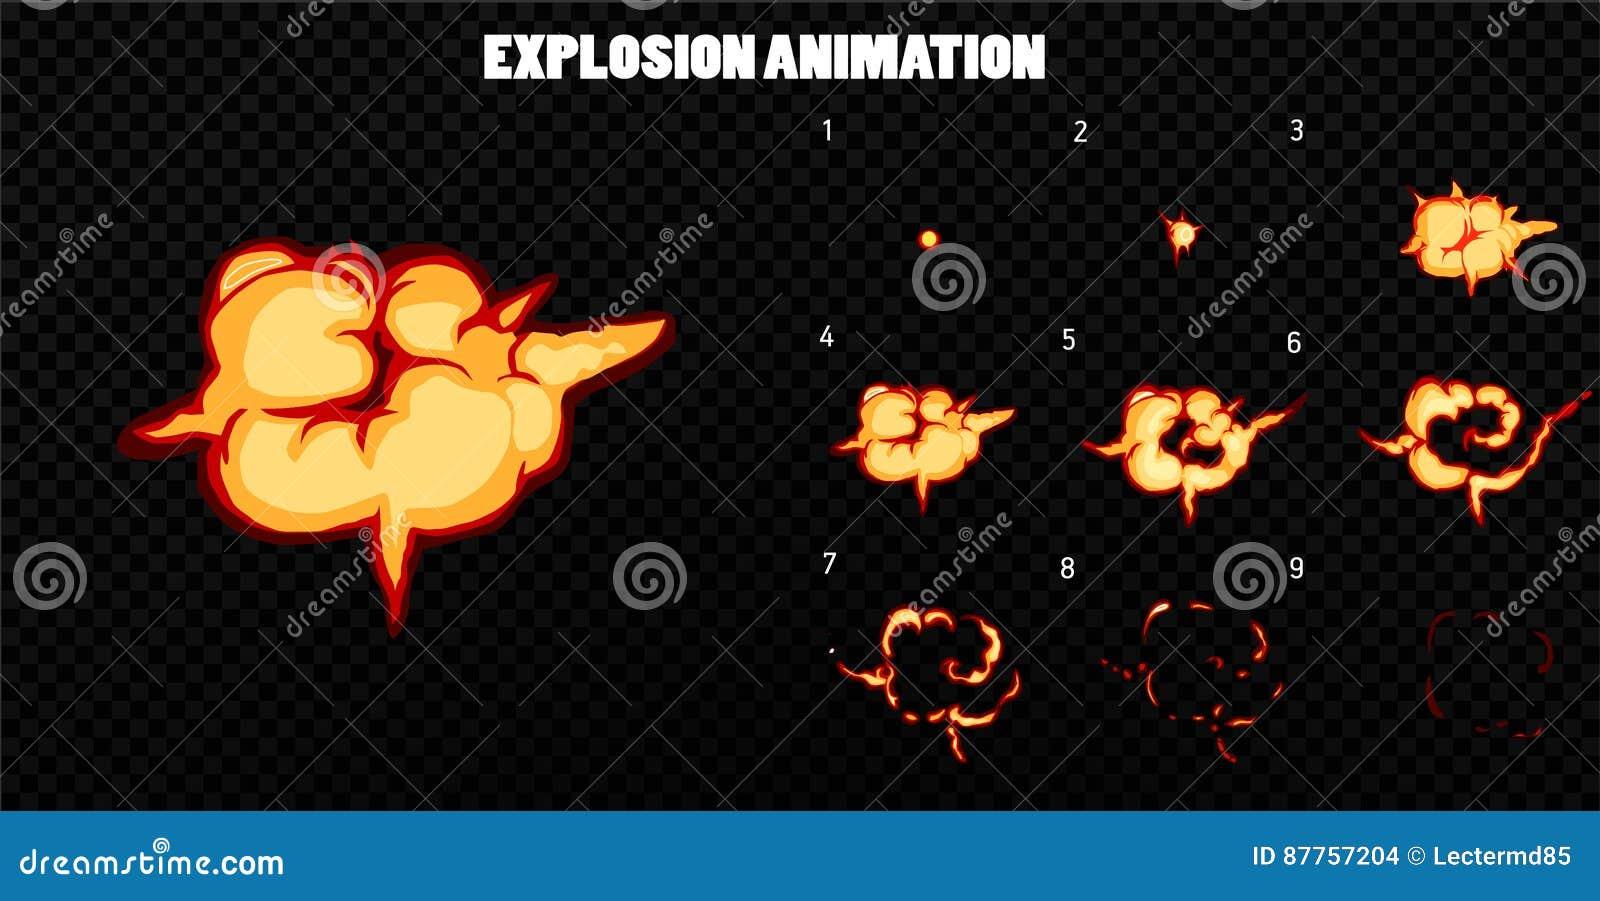 Explode Animation. Cartoon Smoke Explosion Frames Cartoon Vector ...